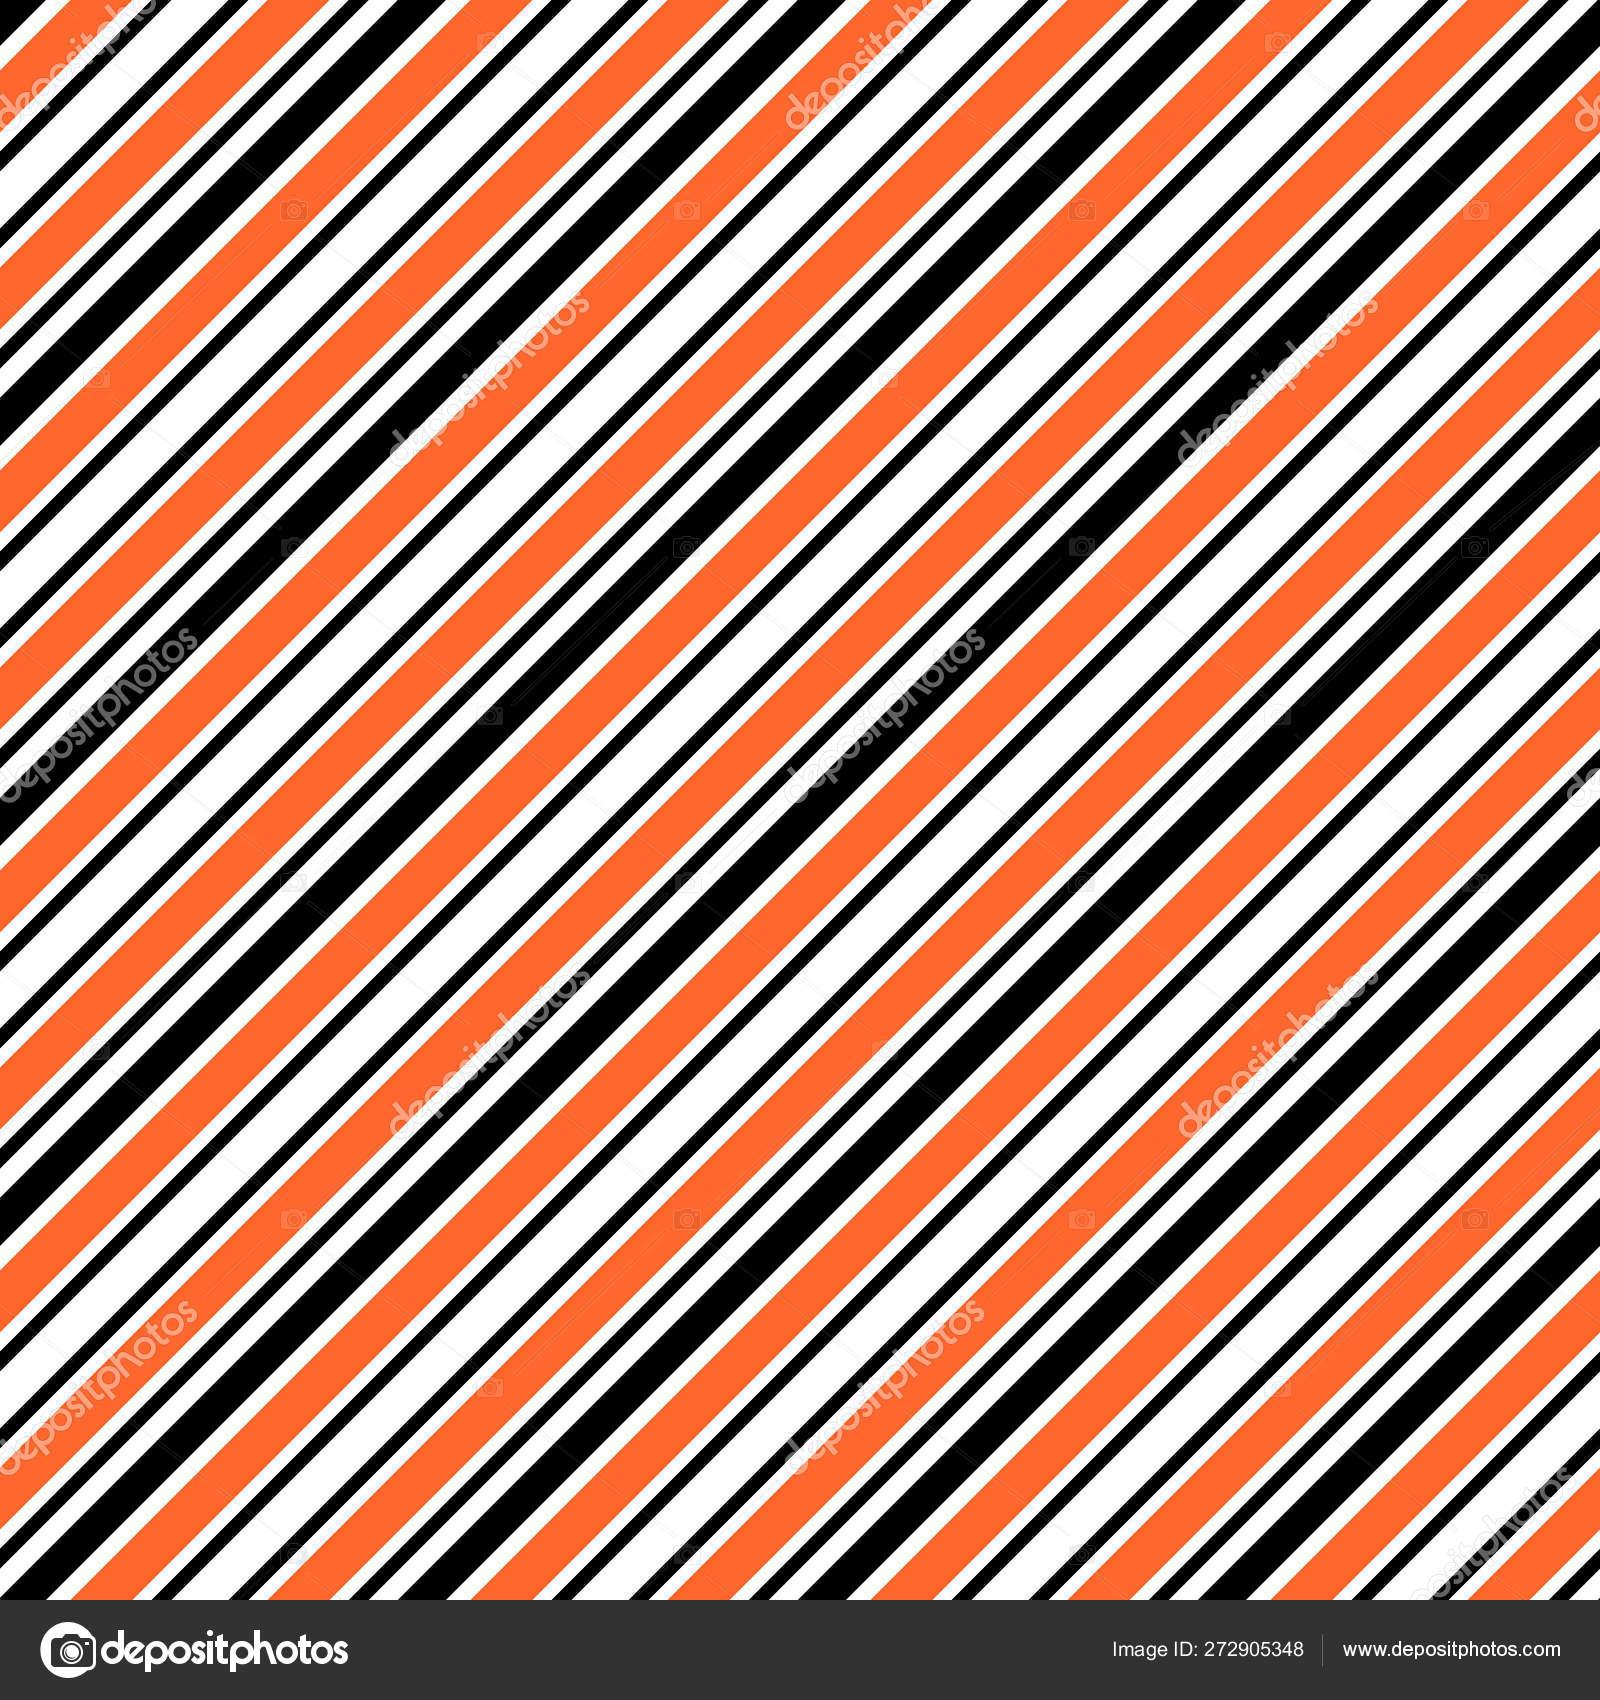 Halloween Stripes Seamless Pattern - Black, orange, and